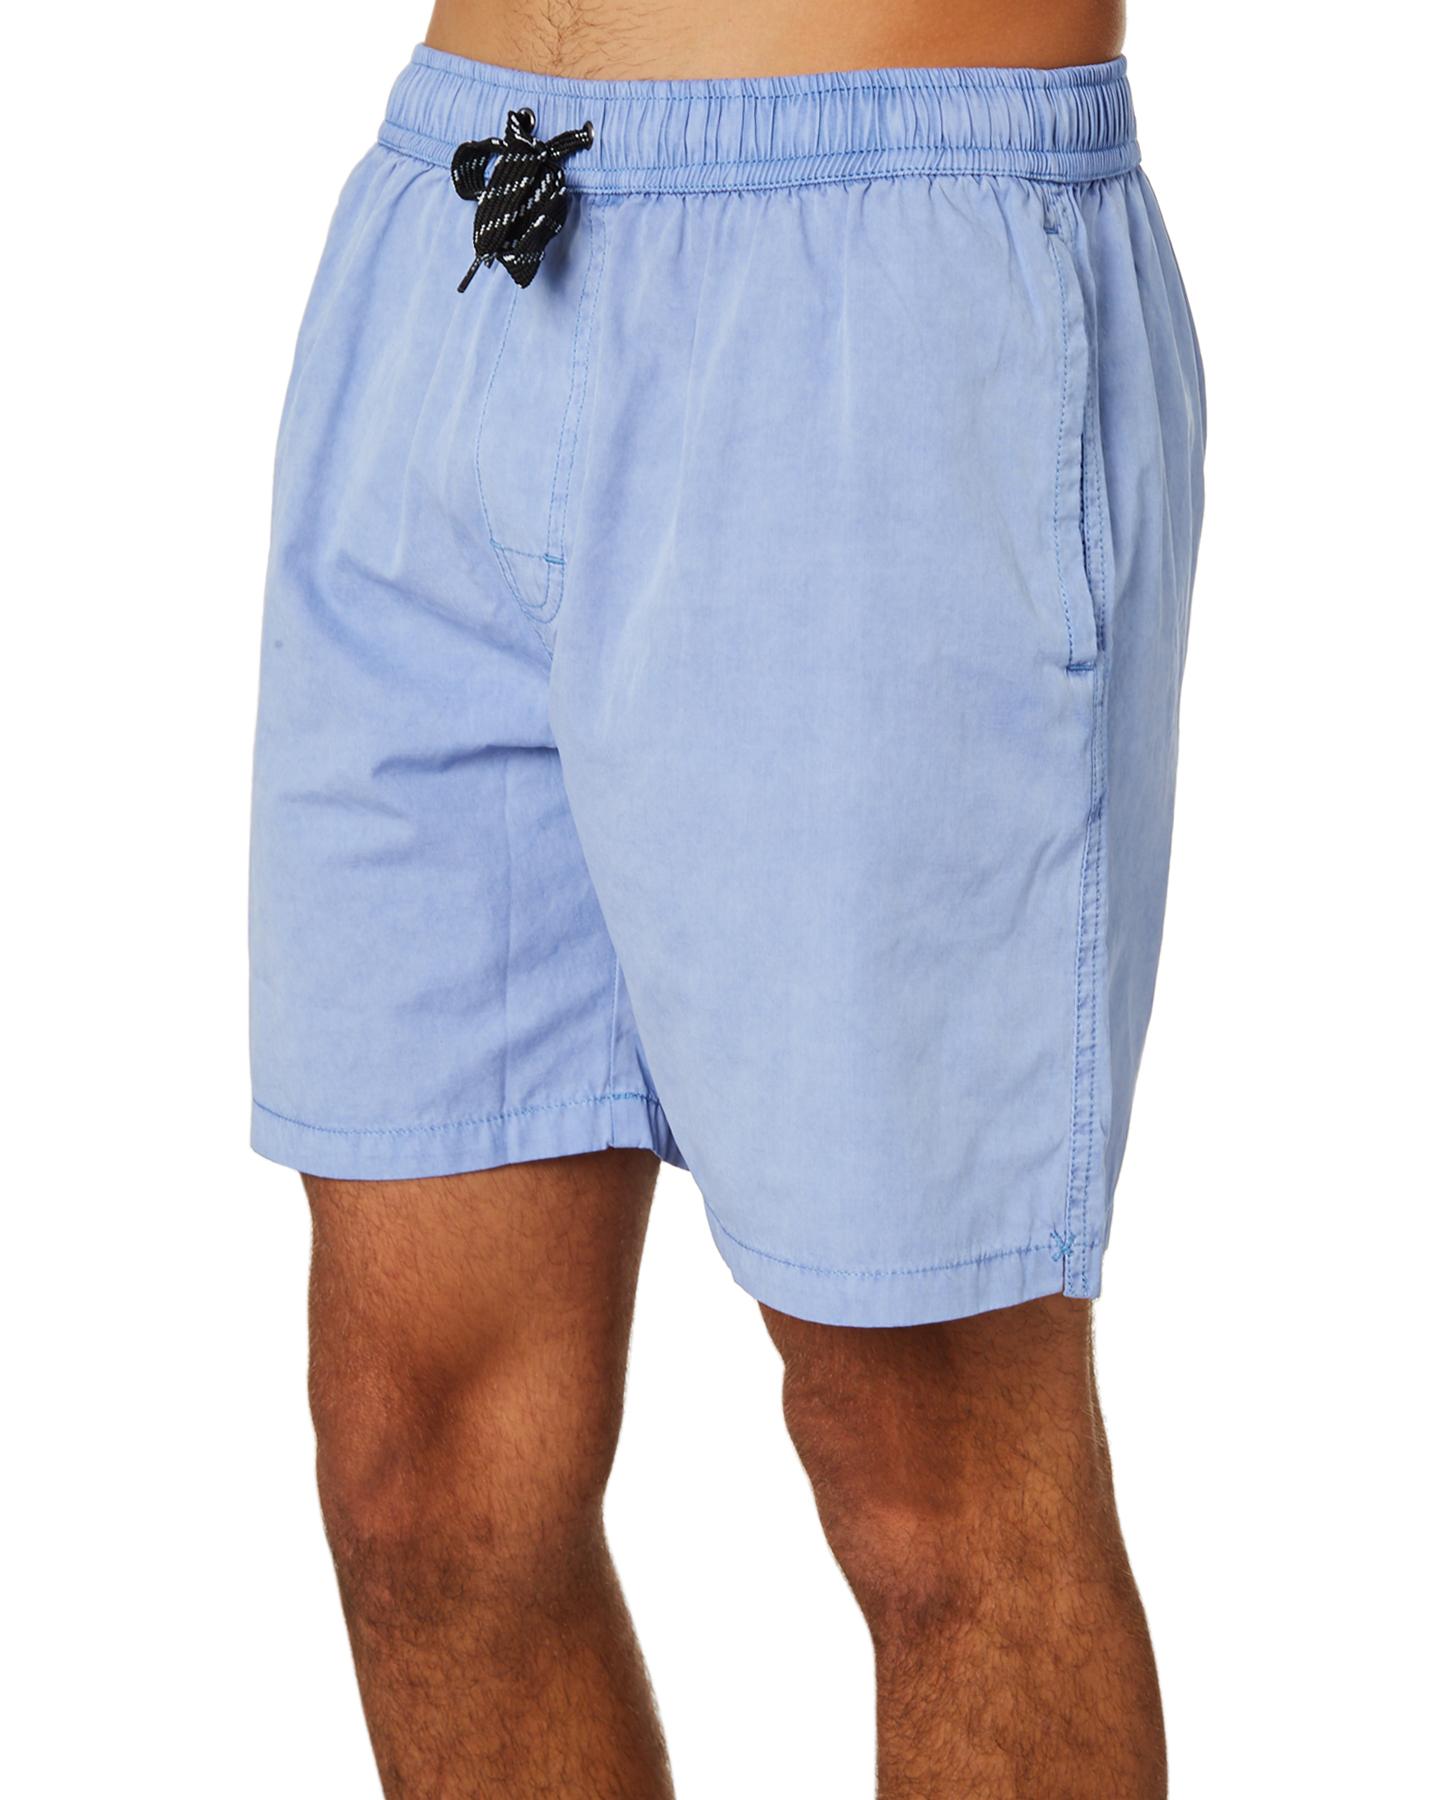 malibu men Shop malibu men's clothing from cafepress find great designs on t-shirts, hoodies, pajamas, sweatshirts, boxer shorts and more free returns 100% satisfaction guarantee fast shipping.